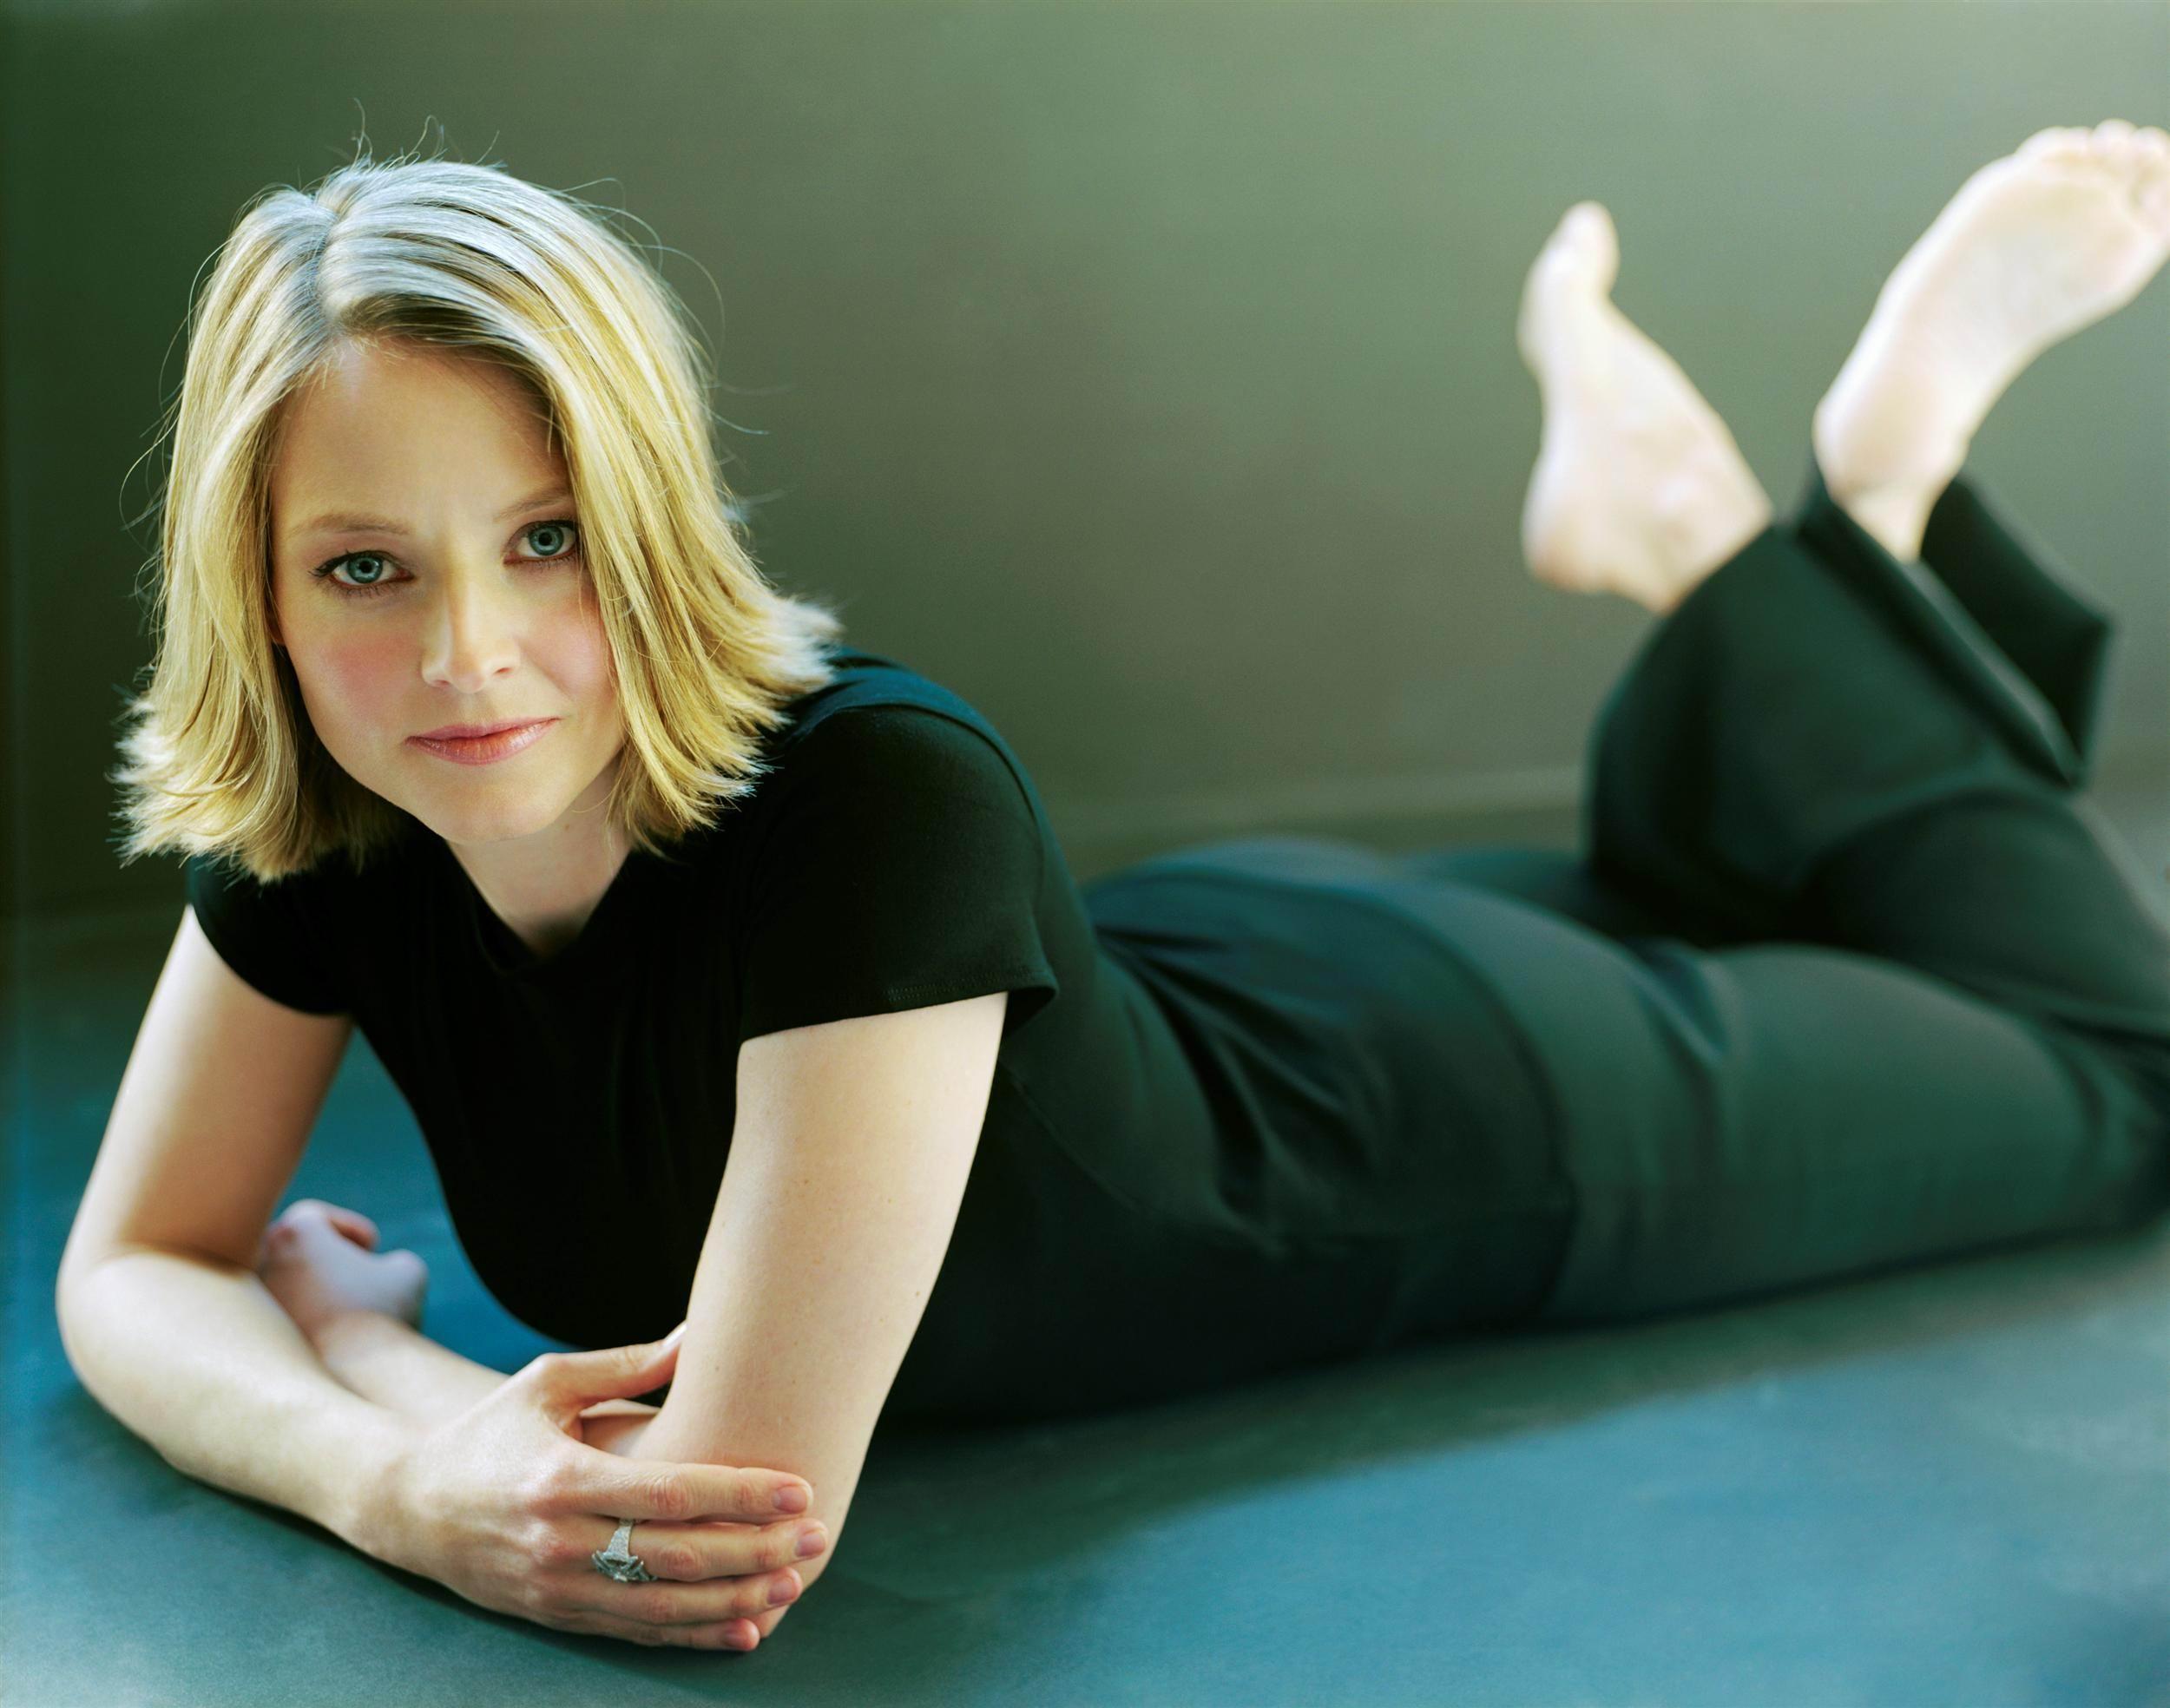 Jodie Foster fotos desnuda hackeadas